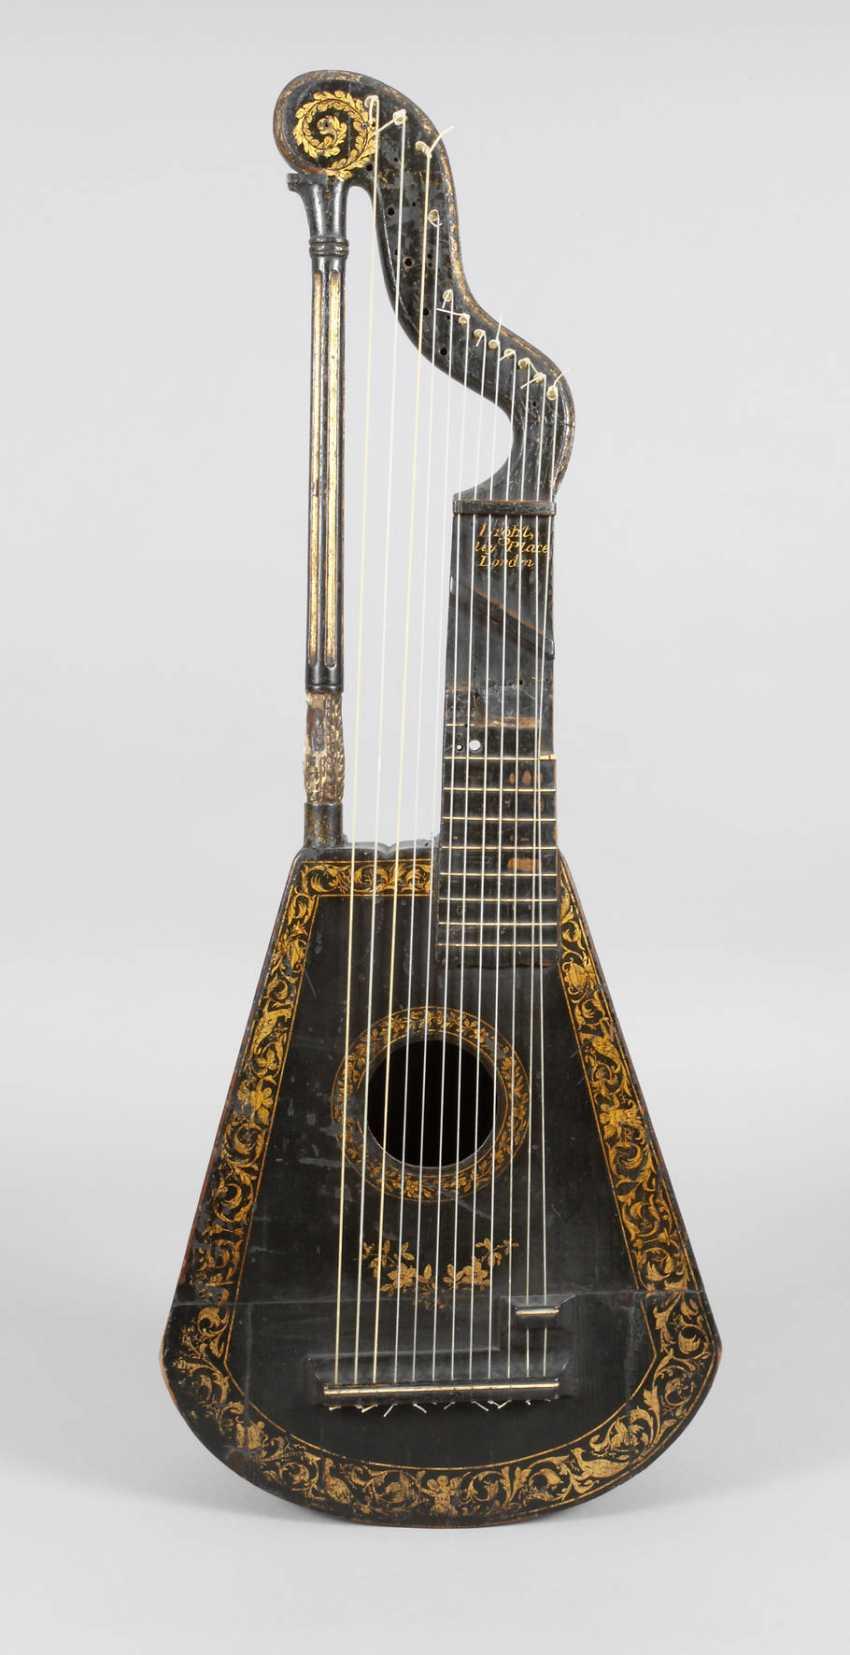 Harp lute - photo 1